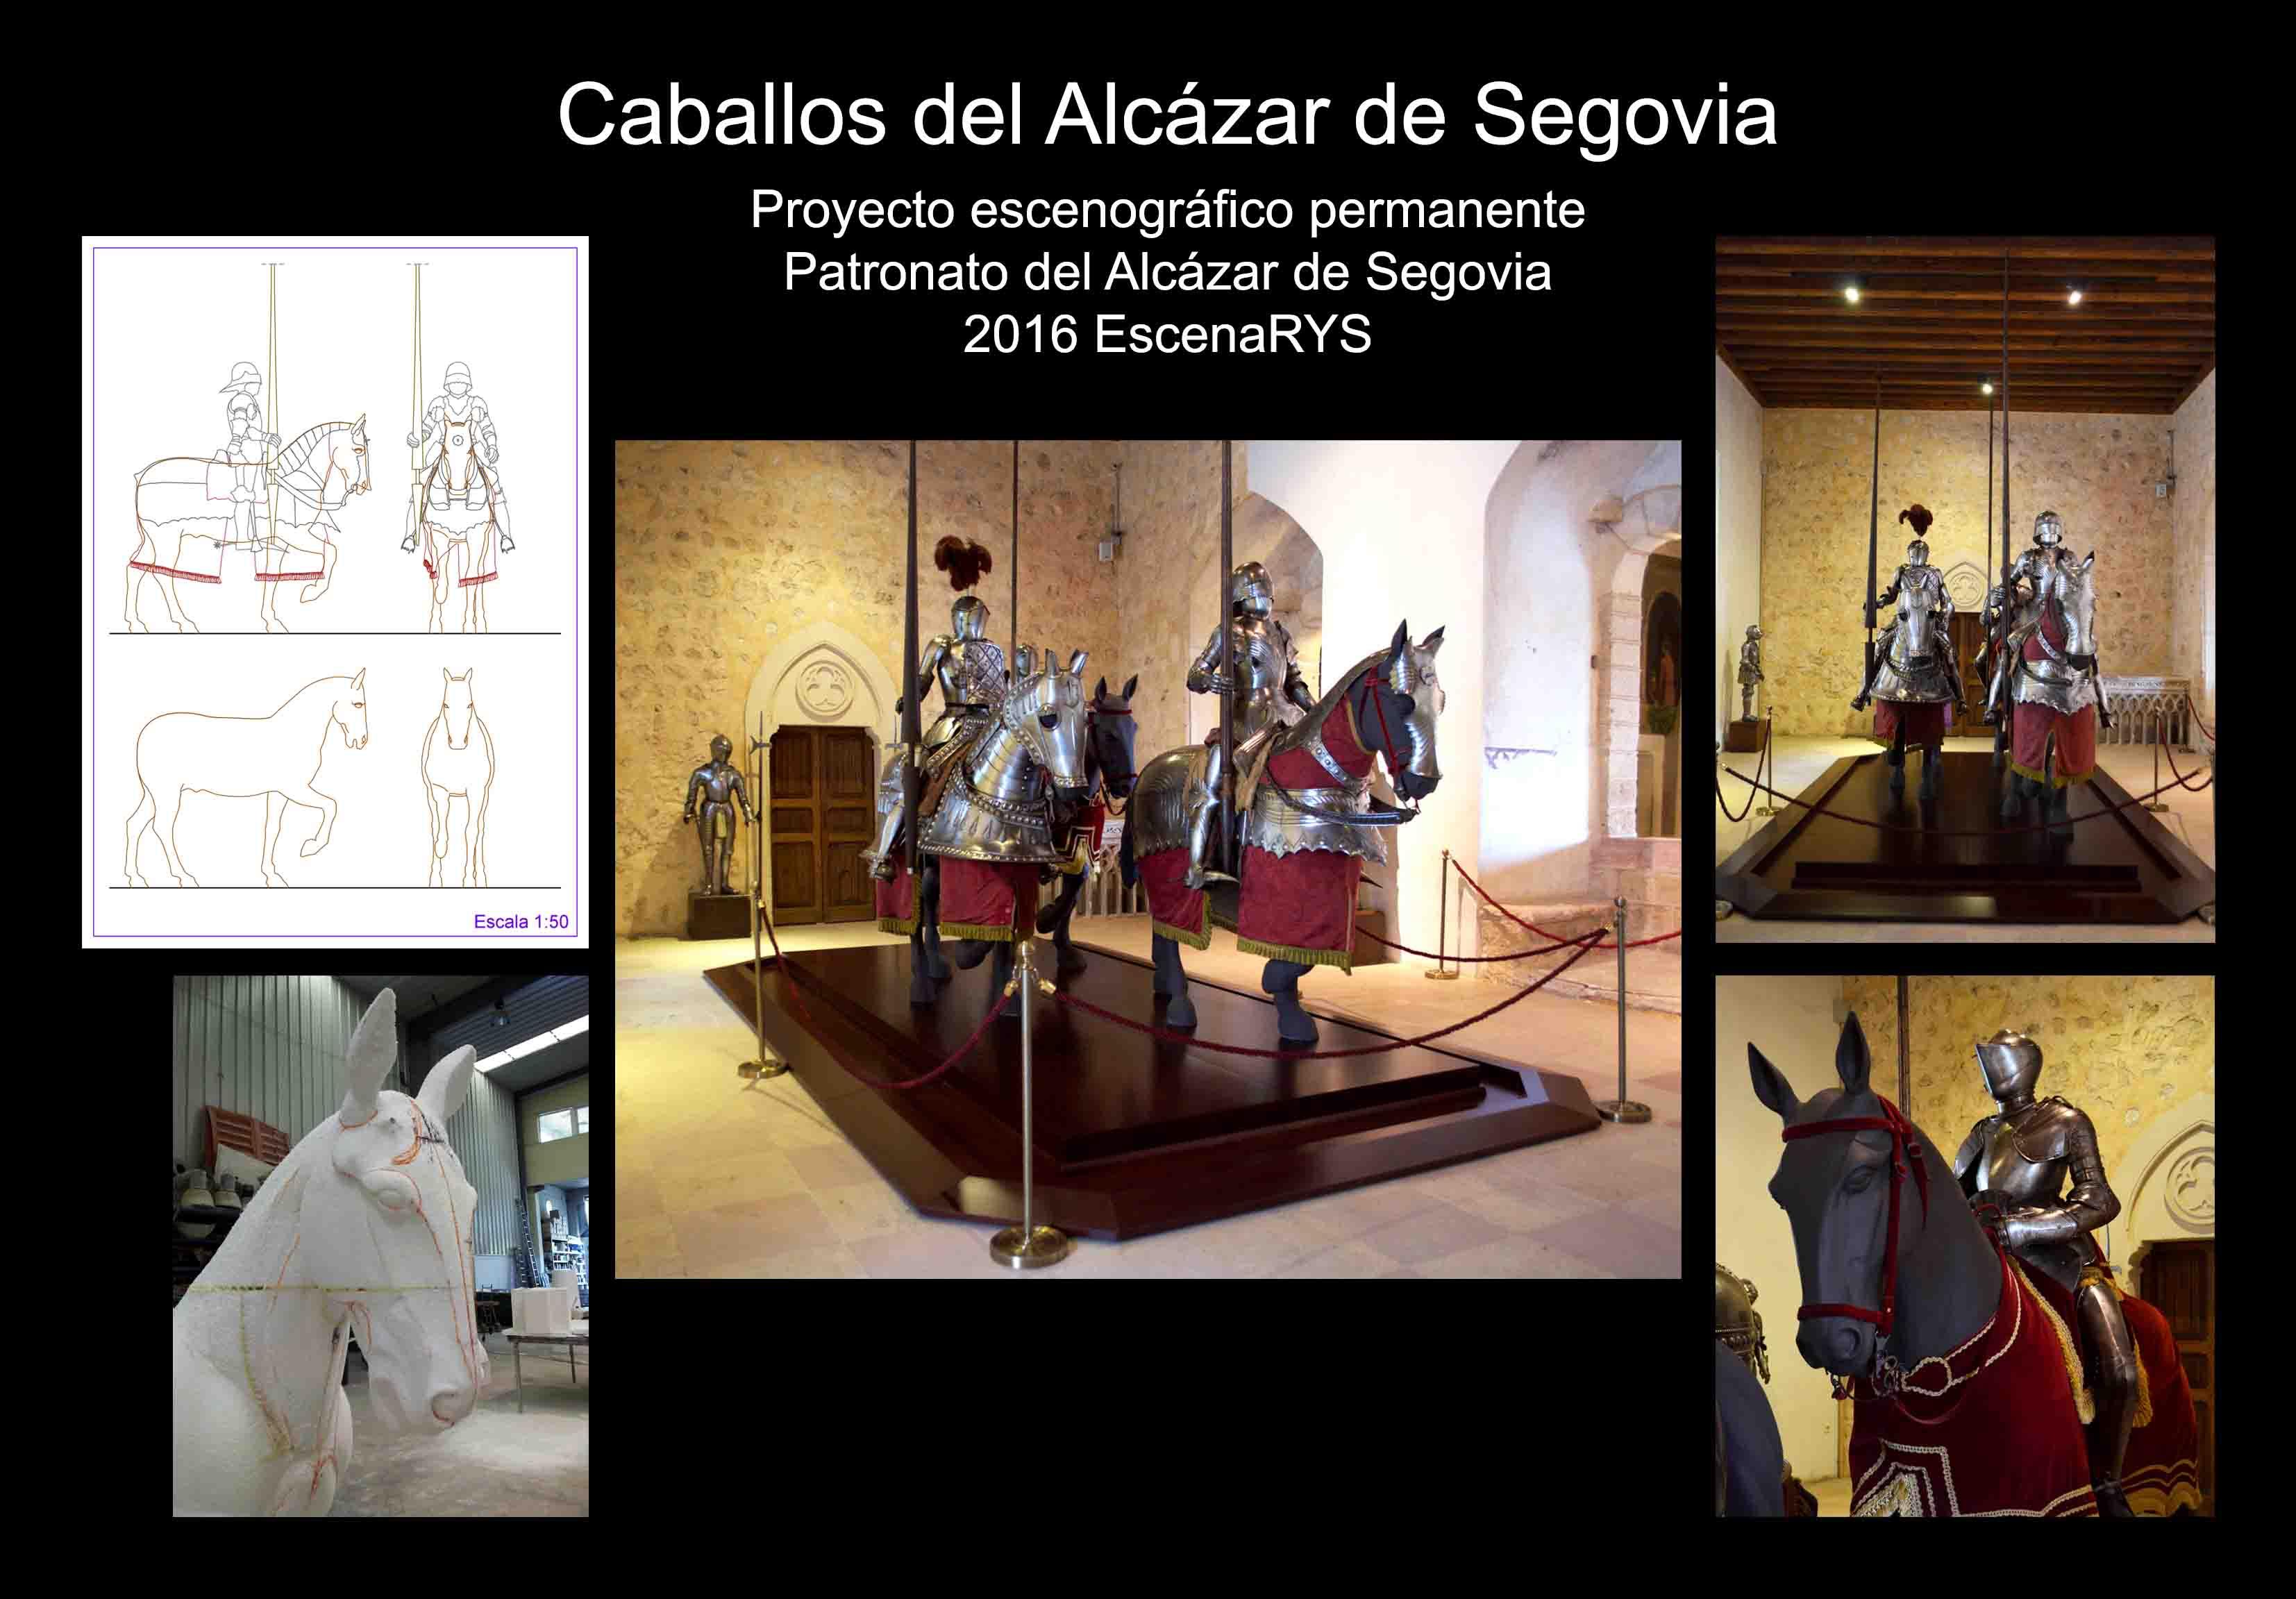 David Temprano e2016 Caballos del Alcázar de Segovia 01